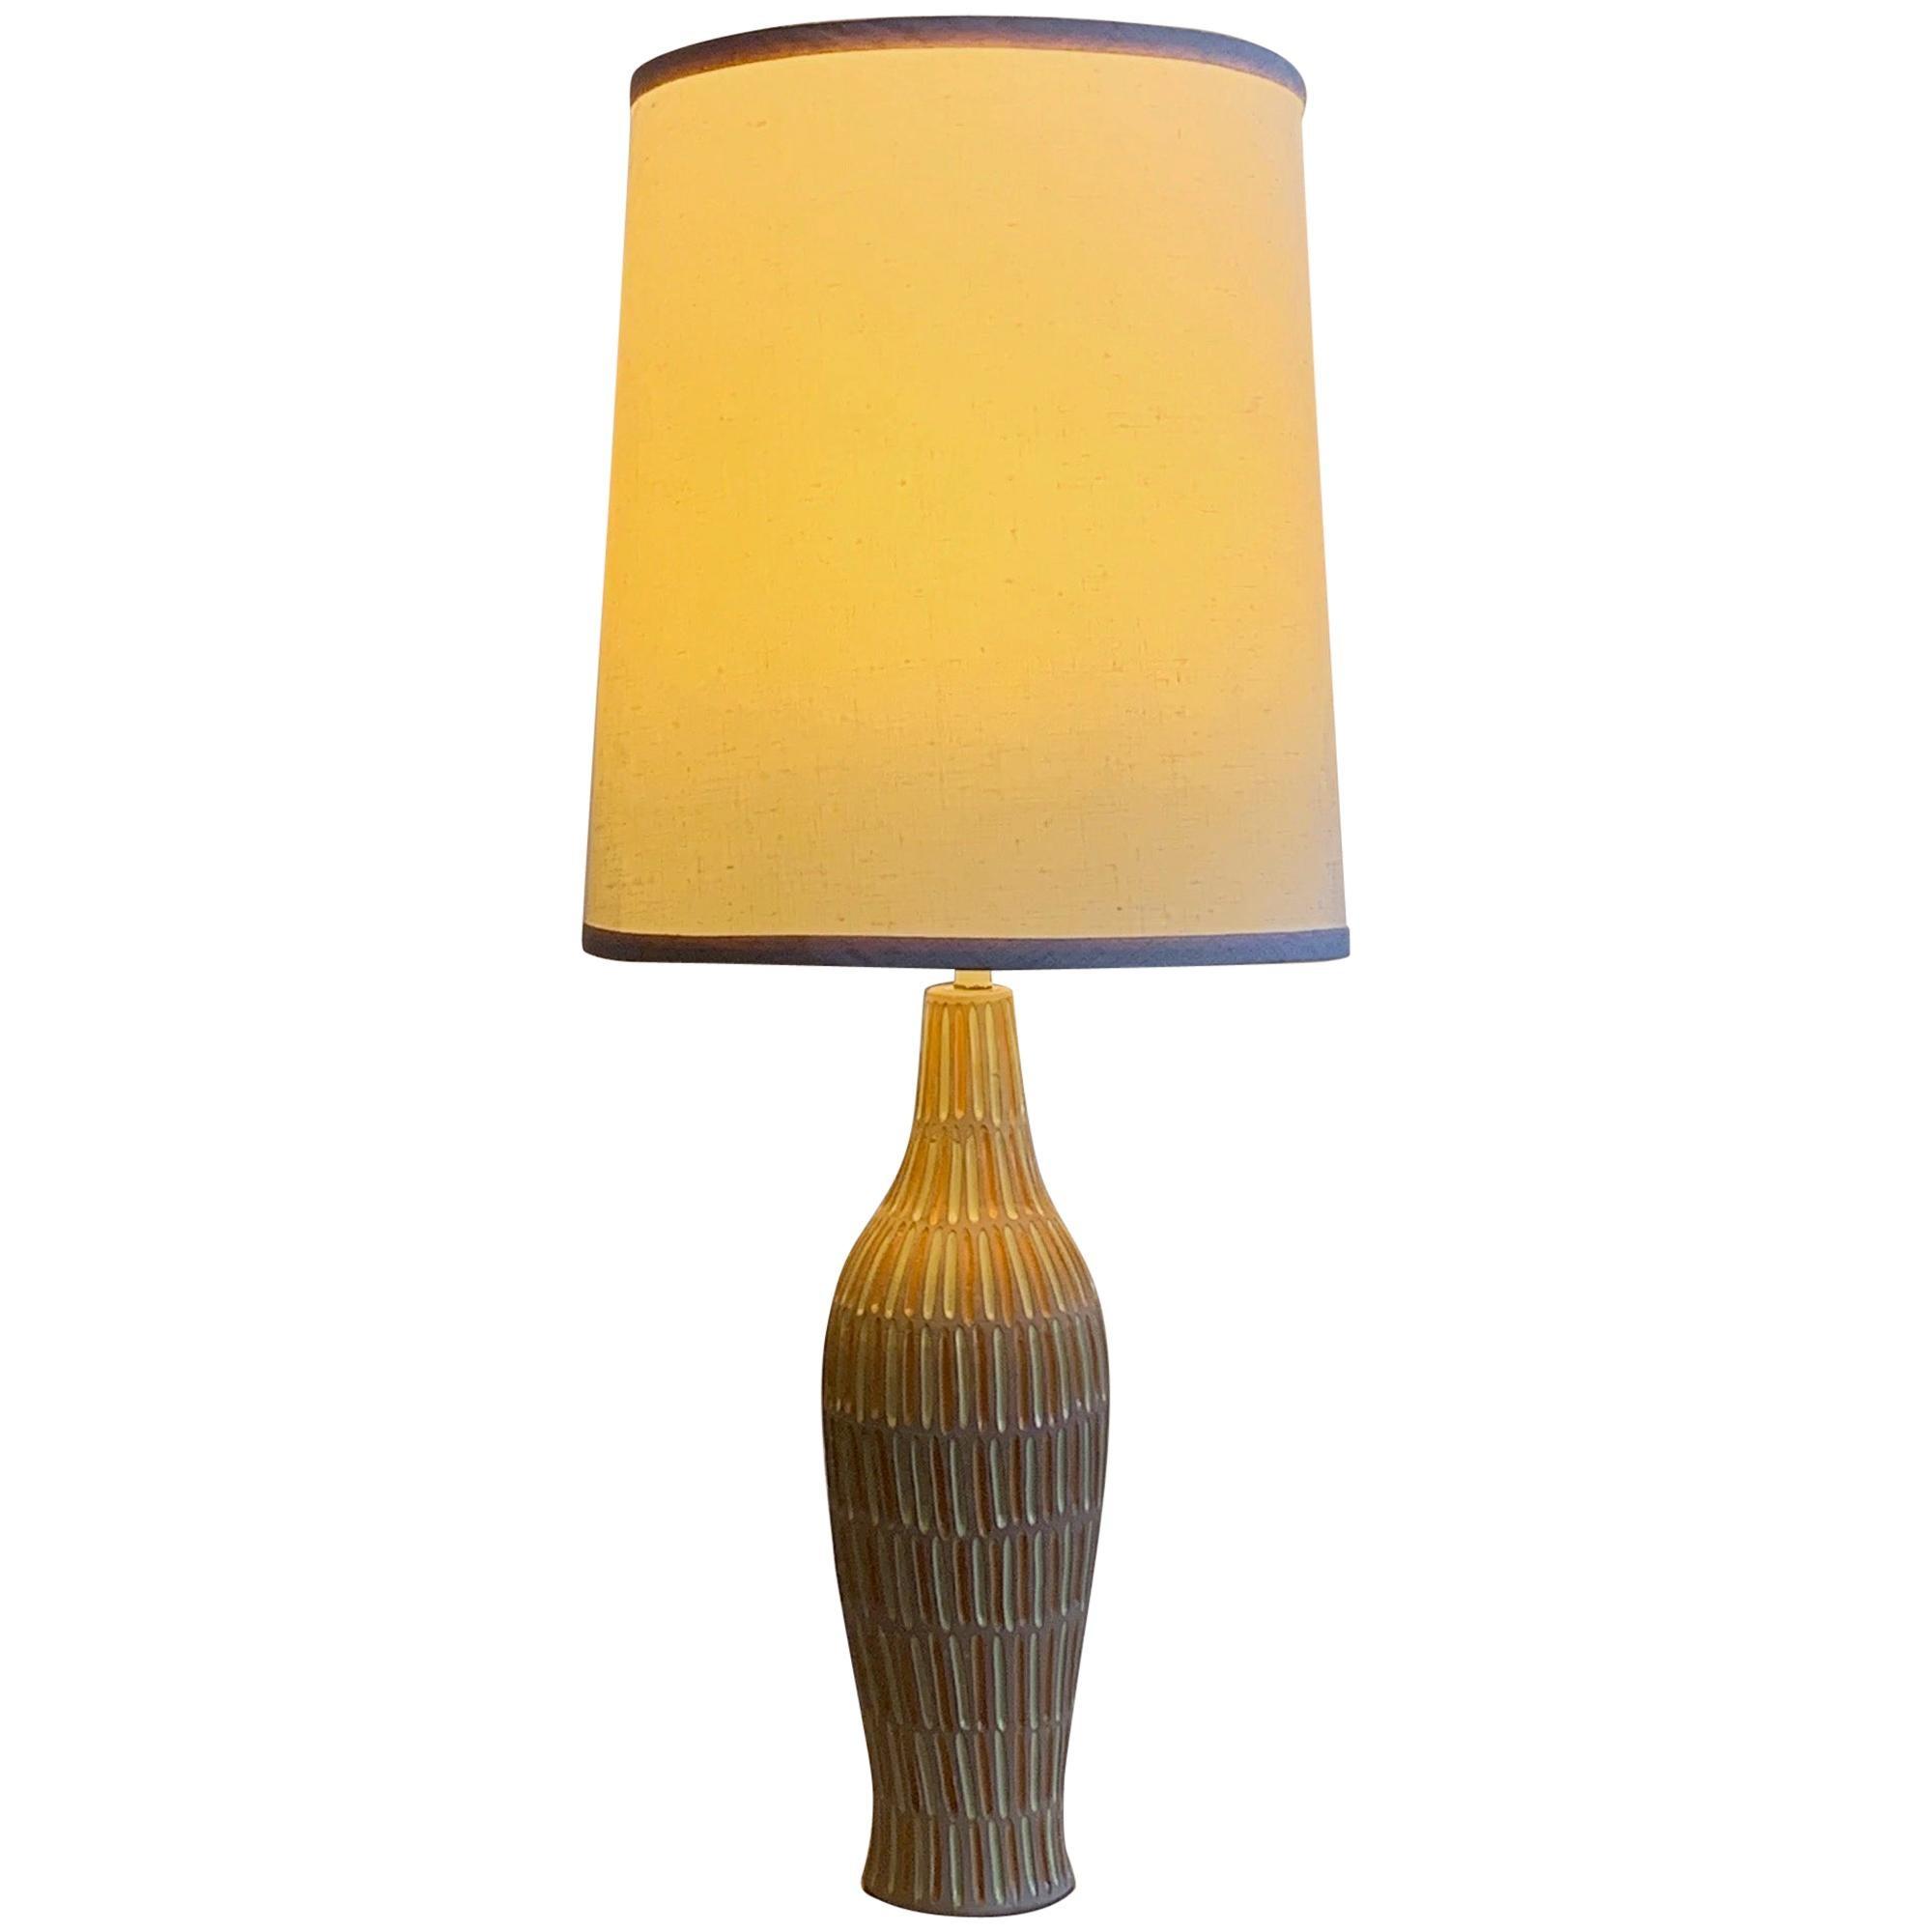 Unusual Ceramic Lamp by Raymor